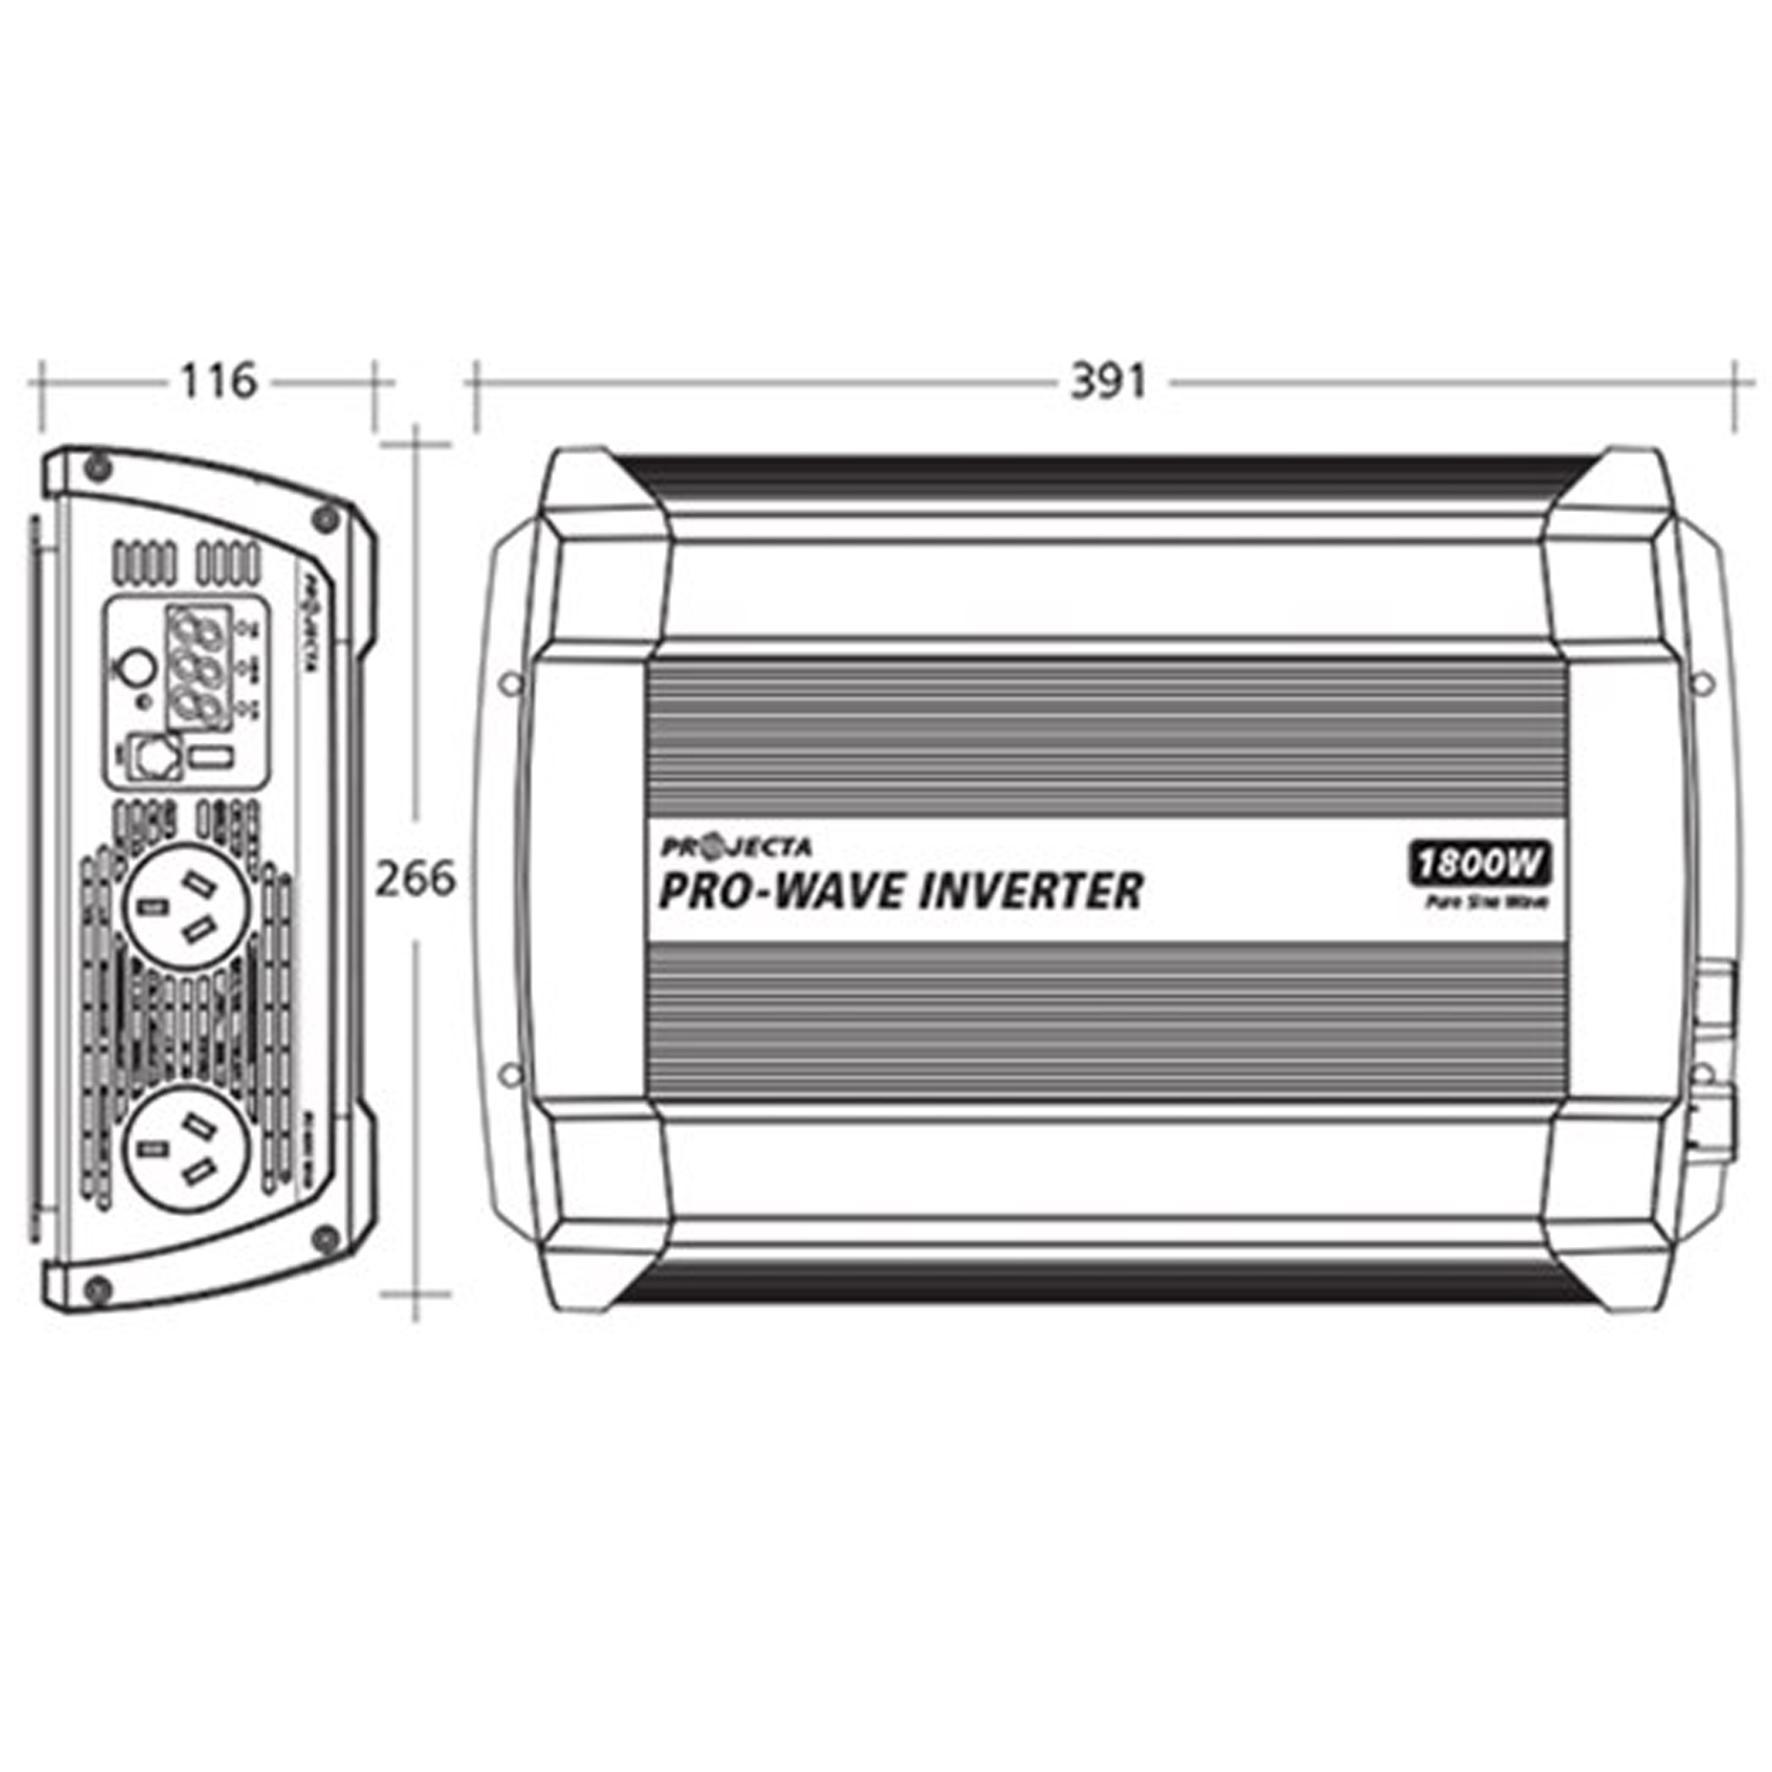 Projecta Pro Wave 1800 Watt Inverter Home Of 12 Volt